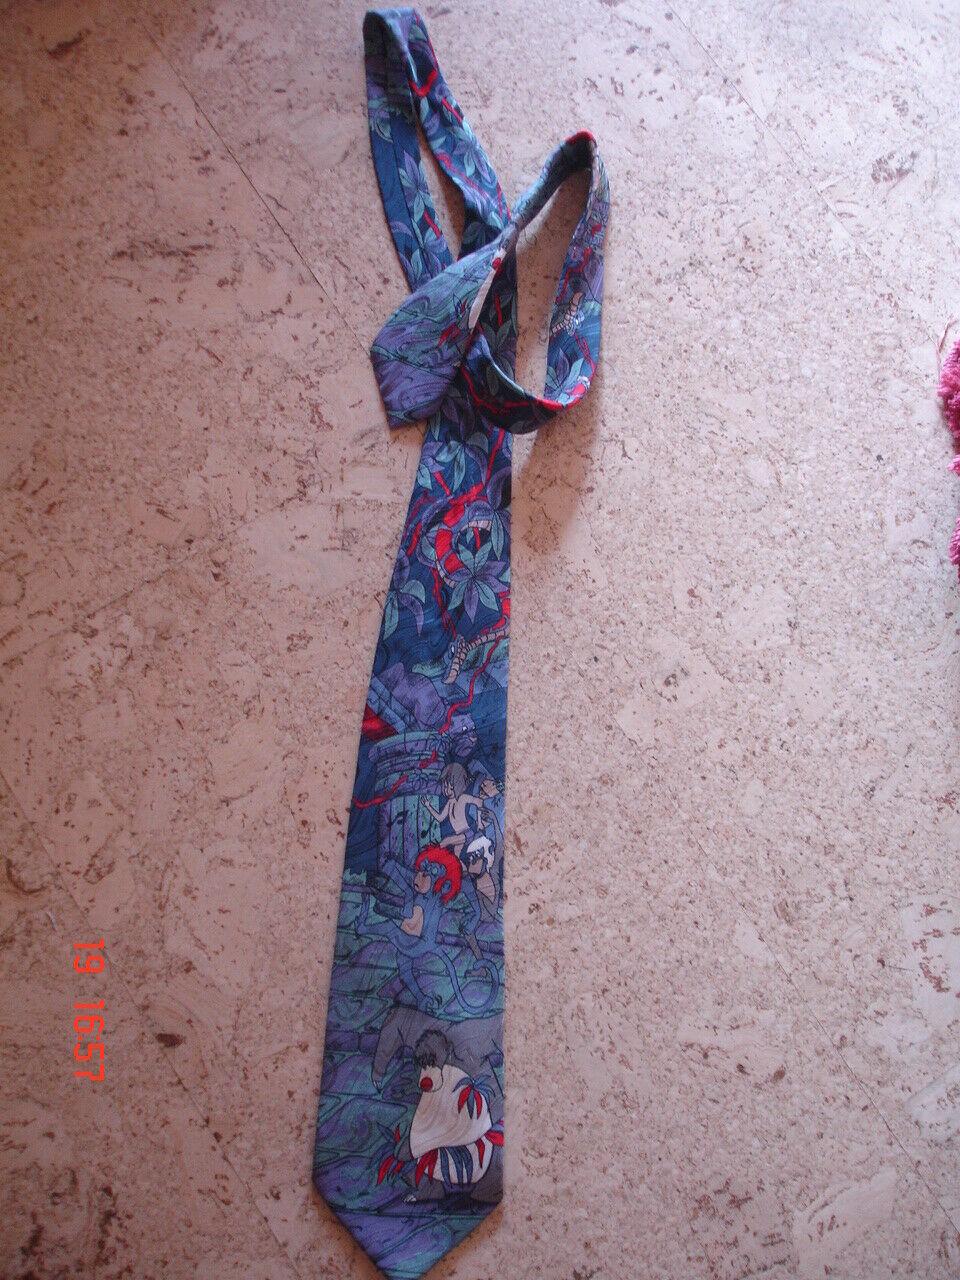 Krawatte - Seiden-Krawatte Motiv: Disney Dschungelbuch